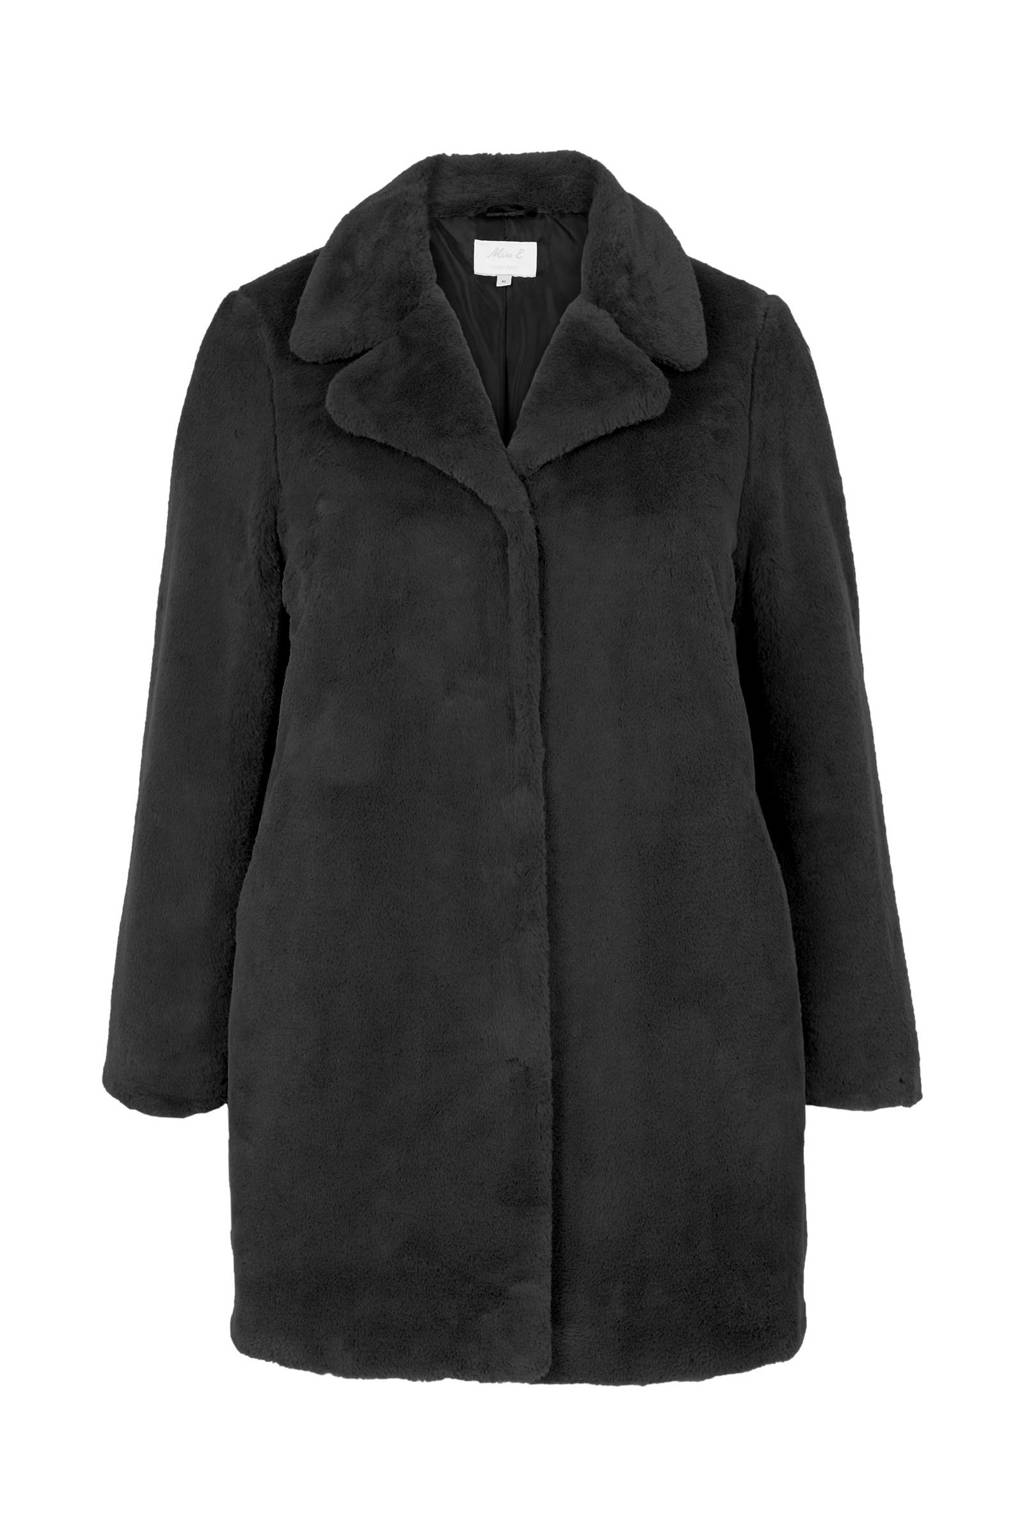 Miss Etam Plus imitatiebont winterjas zwart, Zwart